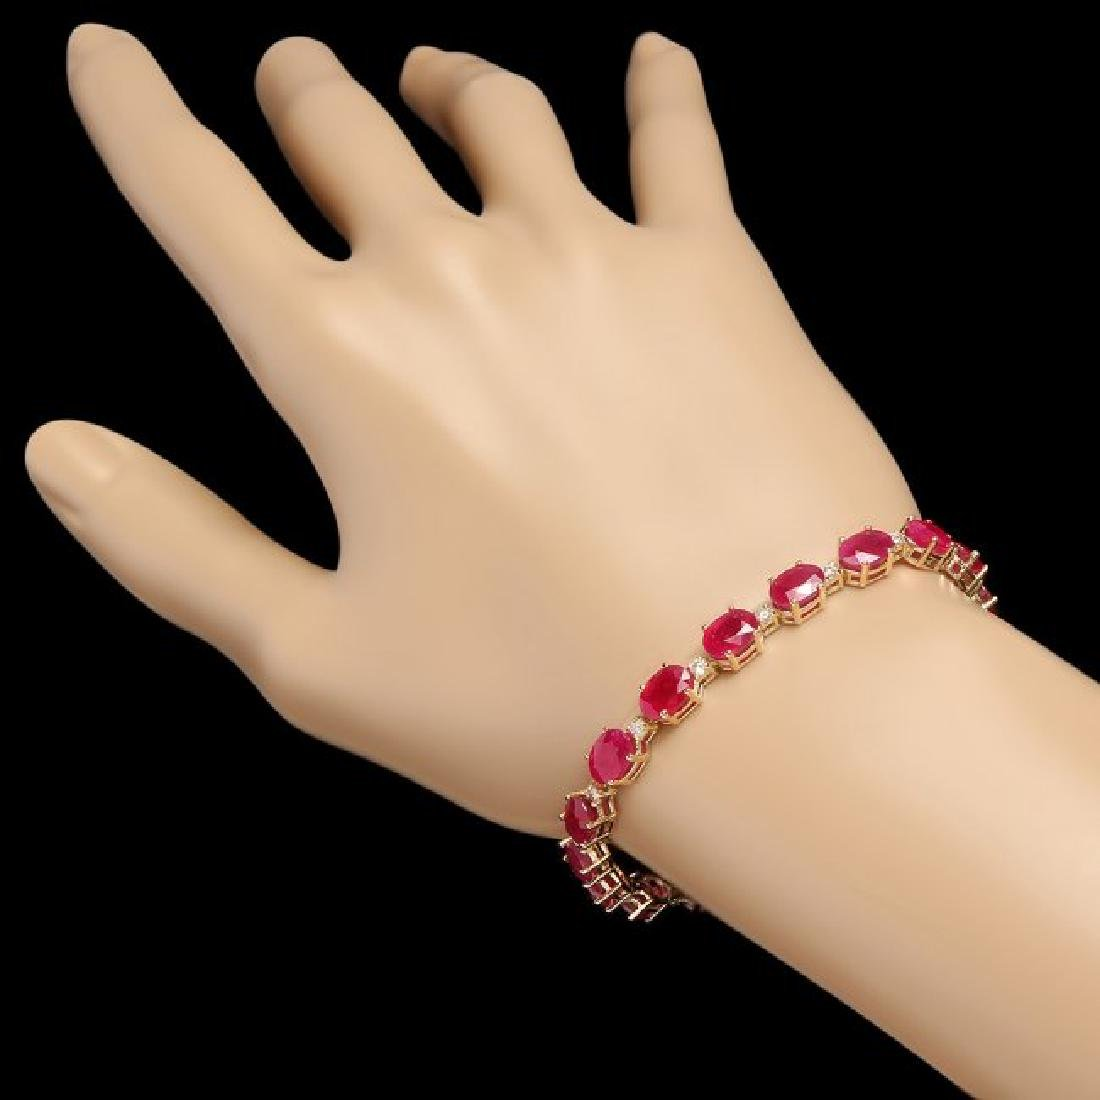 14k Gold 23.50ct Ruby 0.80ct Diamond Bracelet - 3